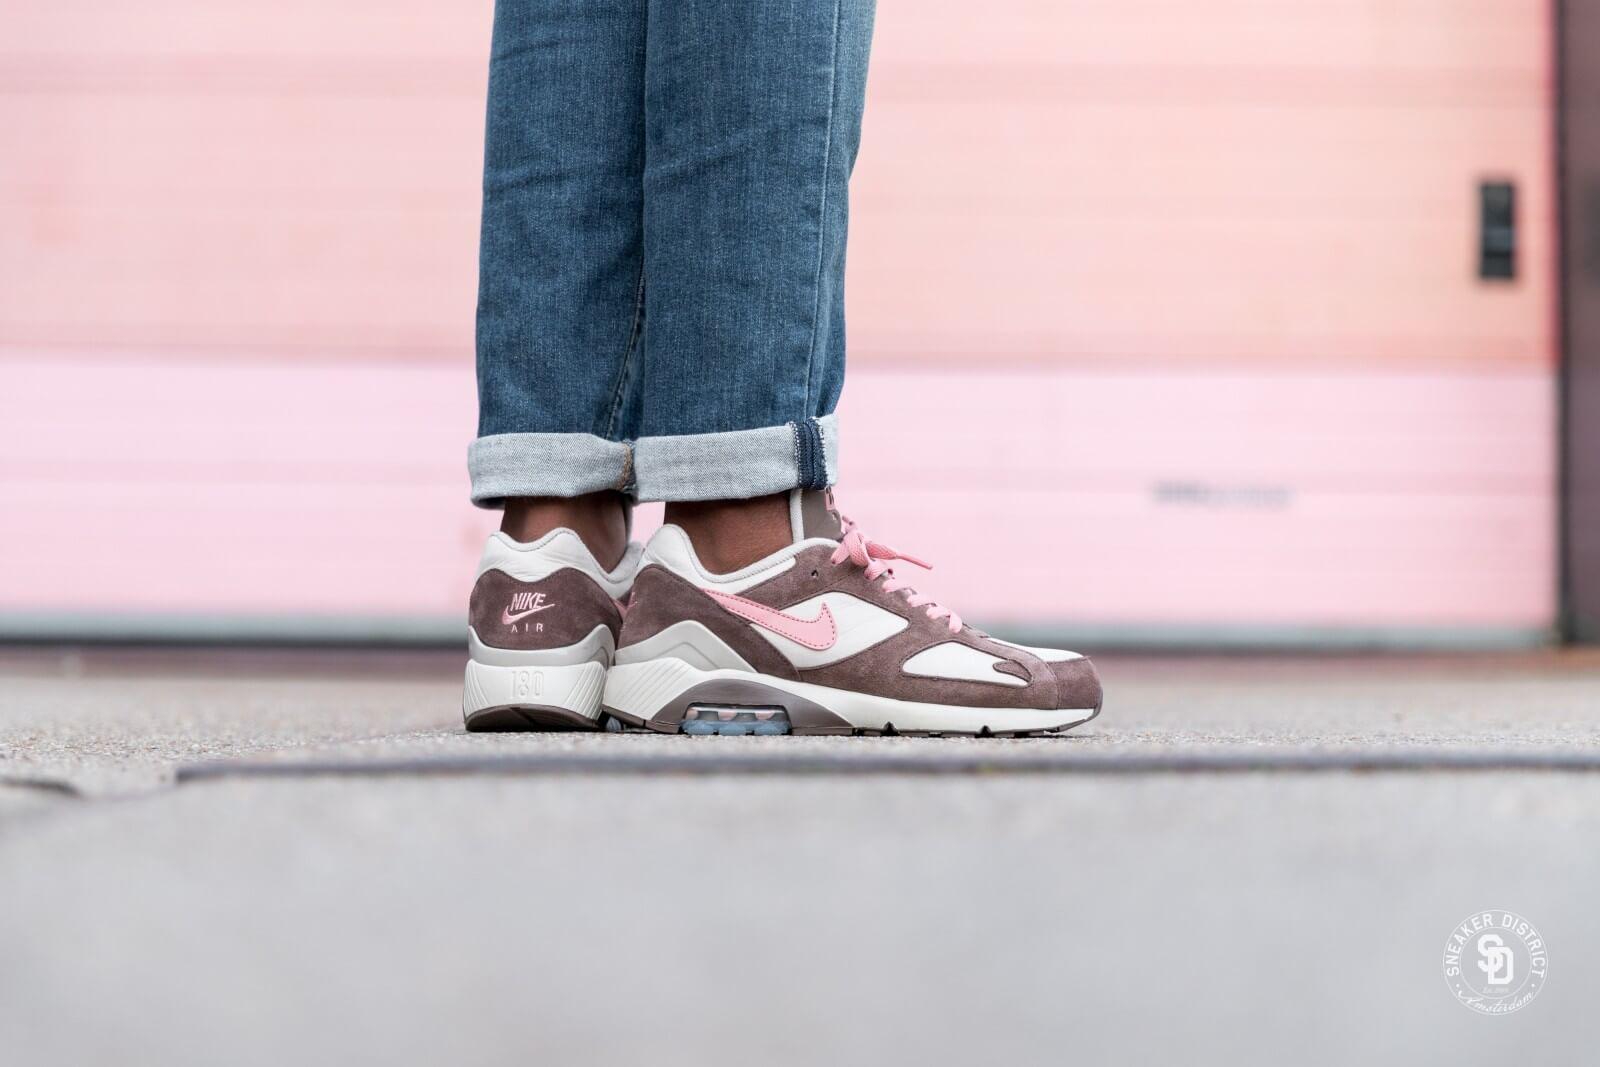 Nike Air Max 180 StringRust Pink Baroque Brown AV7023 200